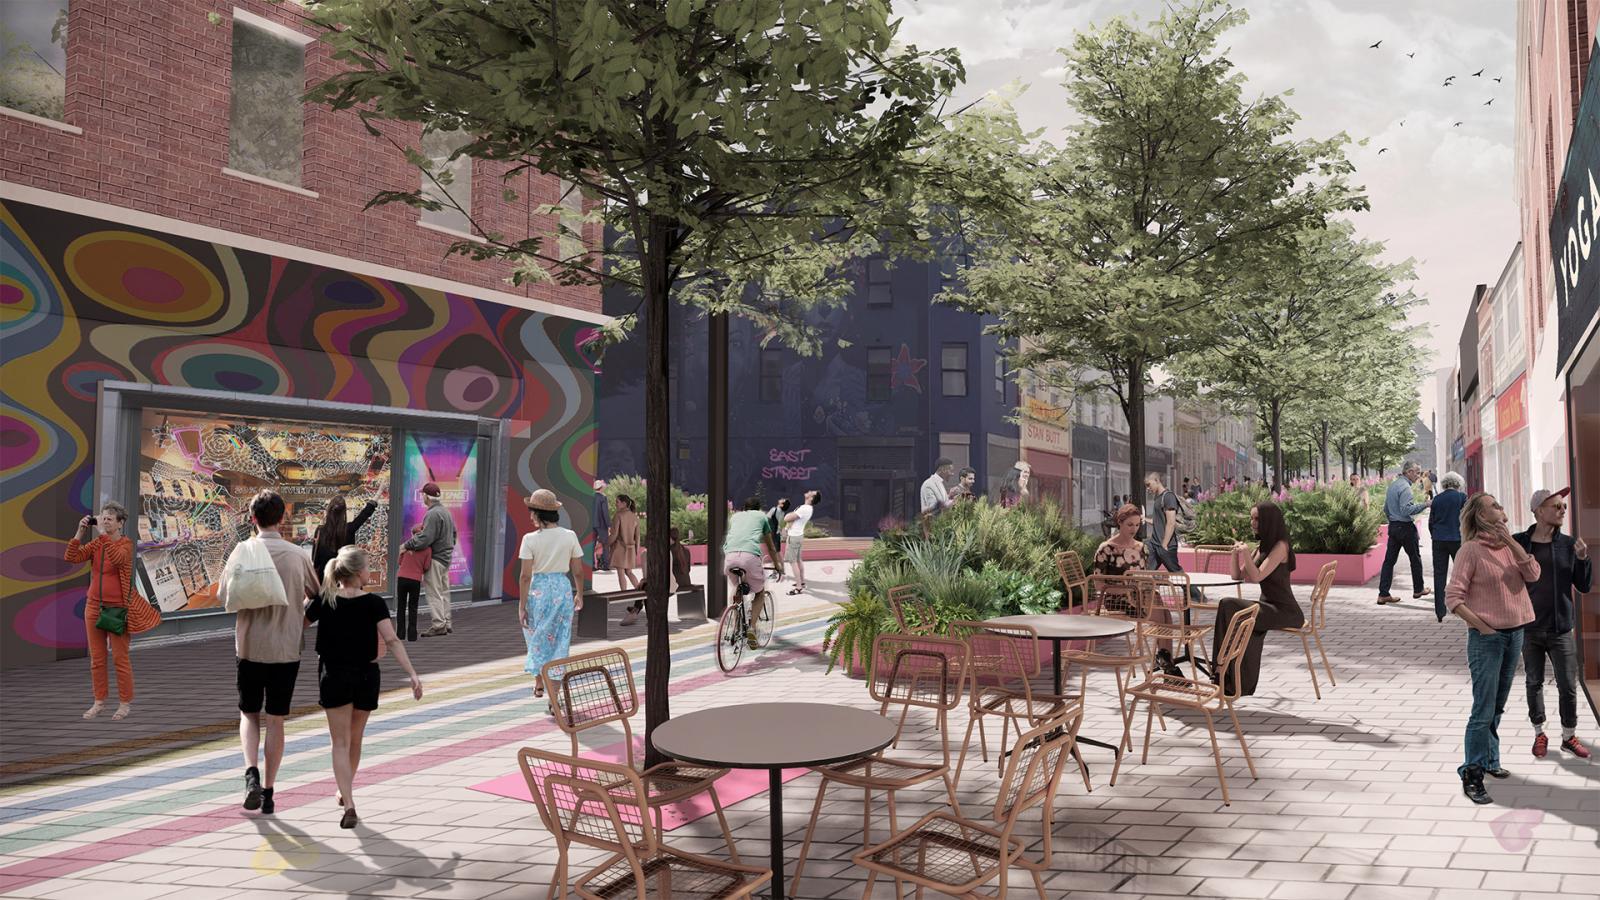 East Street Renewal Photo 2